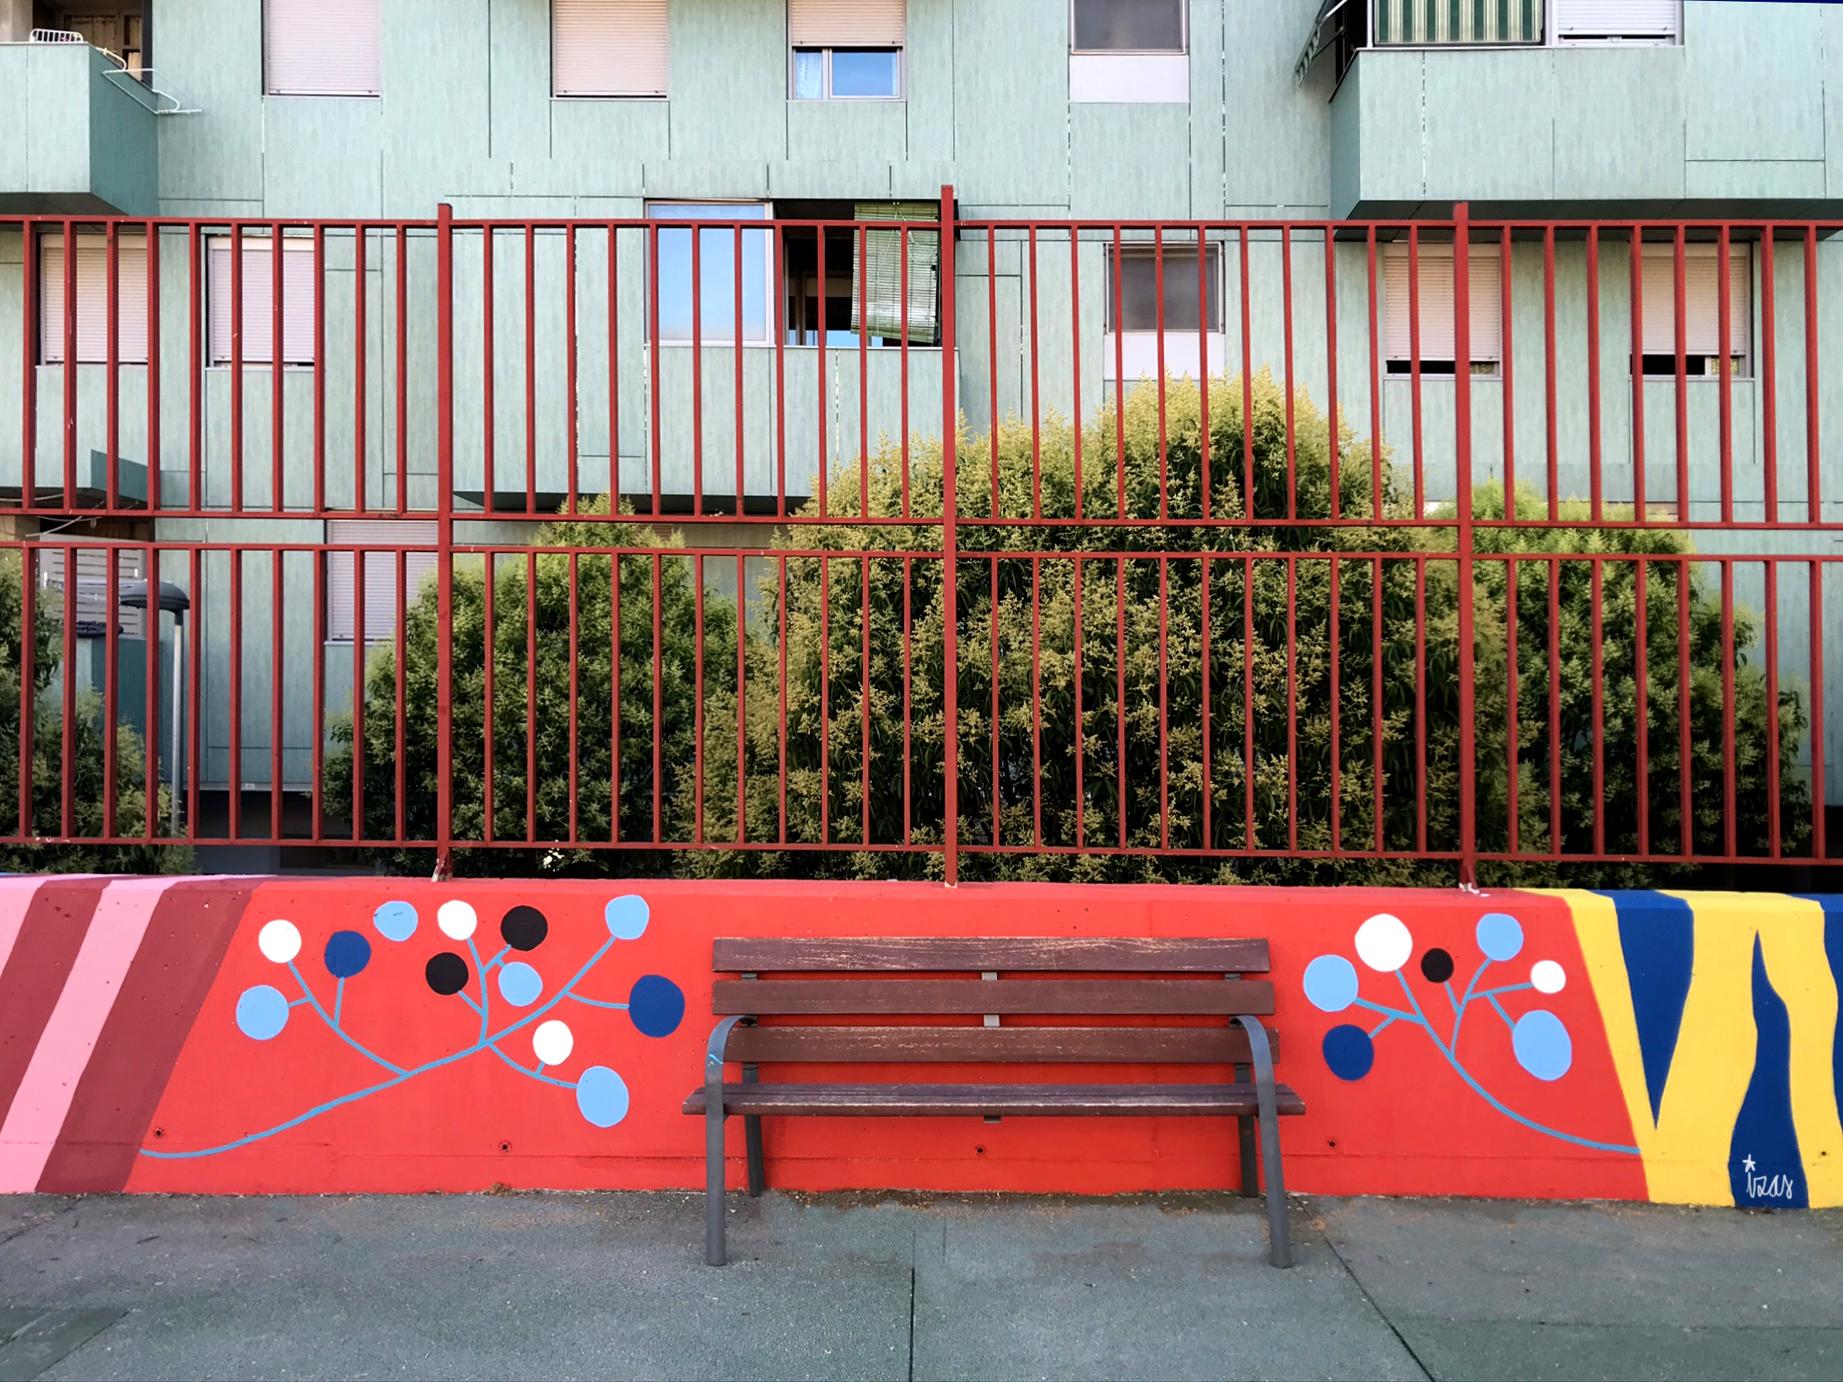 mural izas azulpatio ceip eduardo rojo patio detalle 13